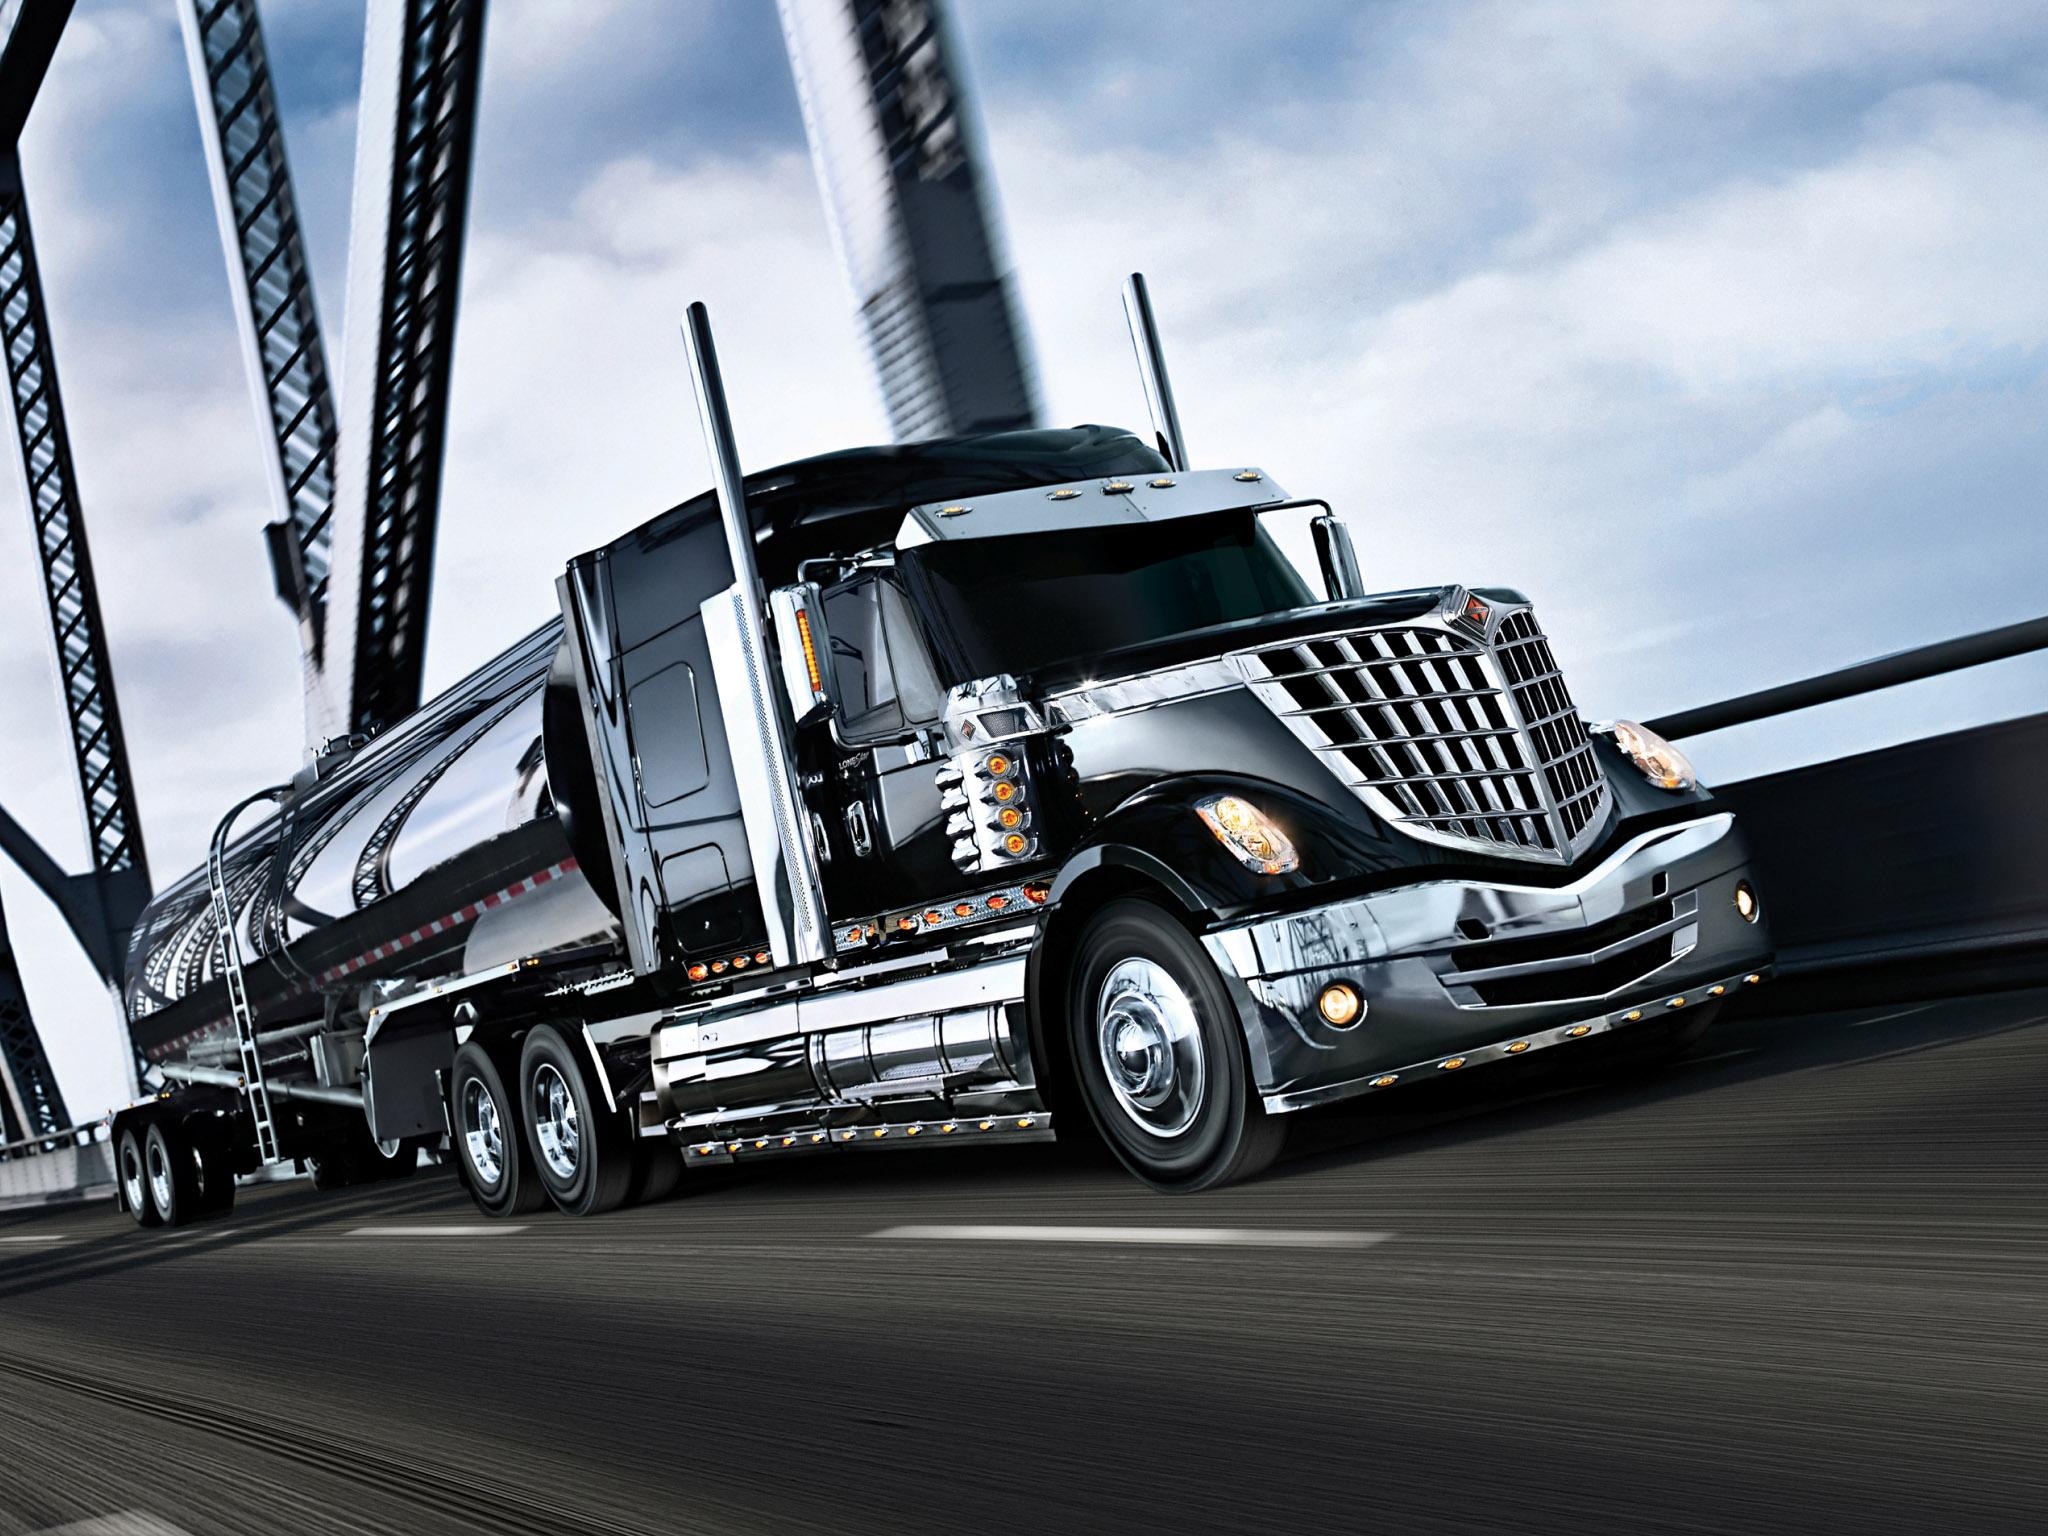 LoneStar semi tractor truck transport fd wallpaper background 2048x1536